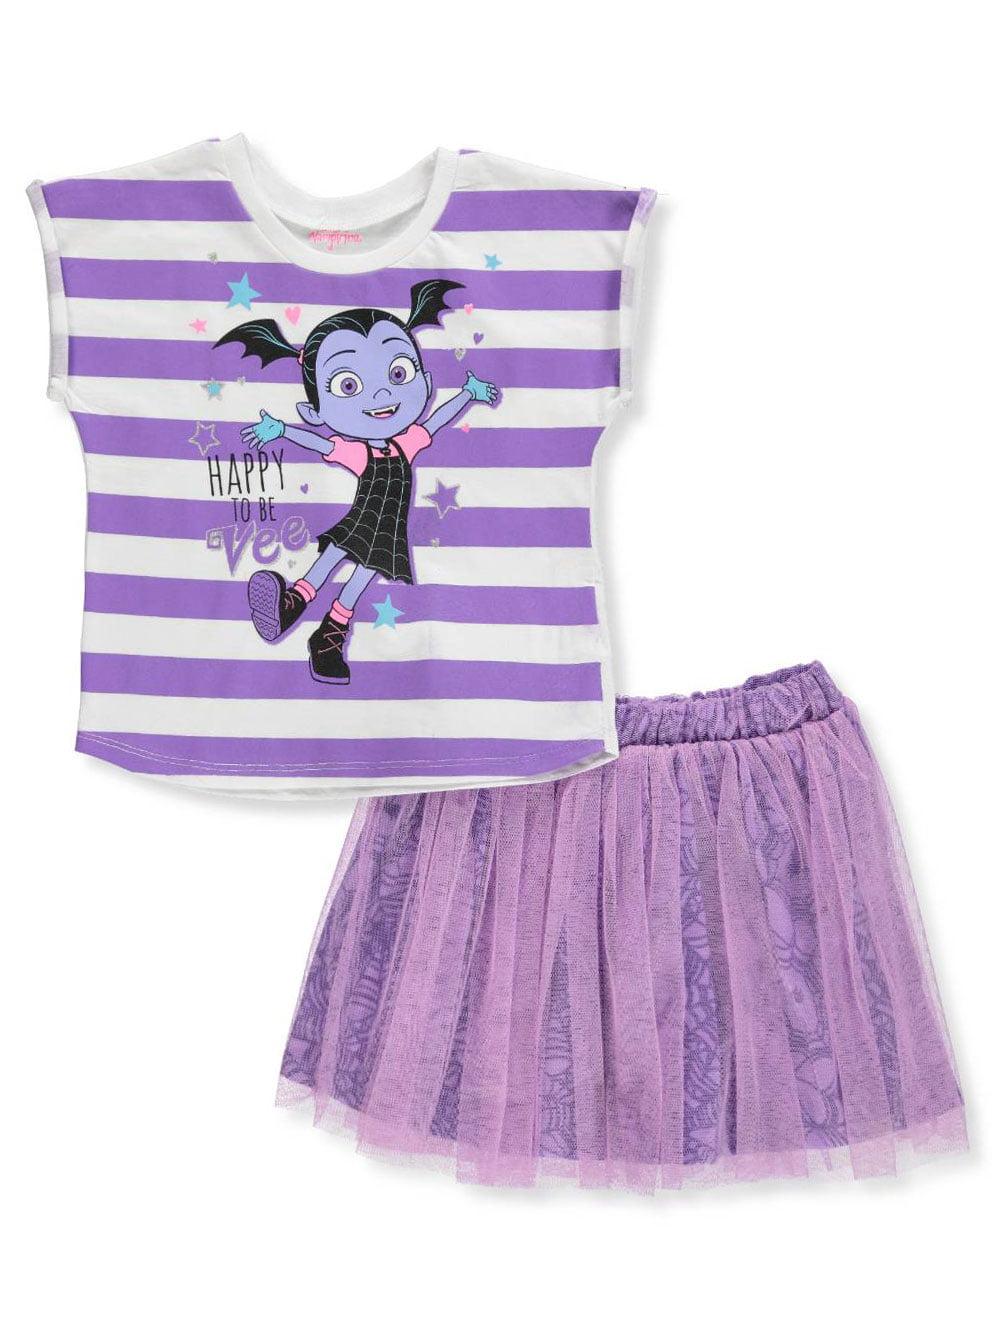 Disney Vampirina Girls 2-Piece Skirt Set Outfit